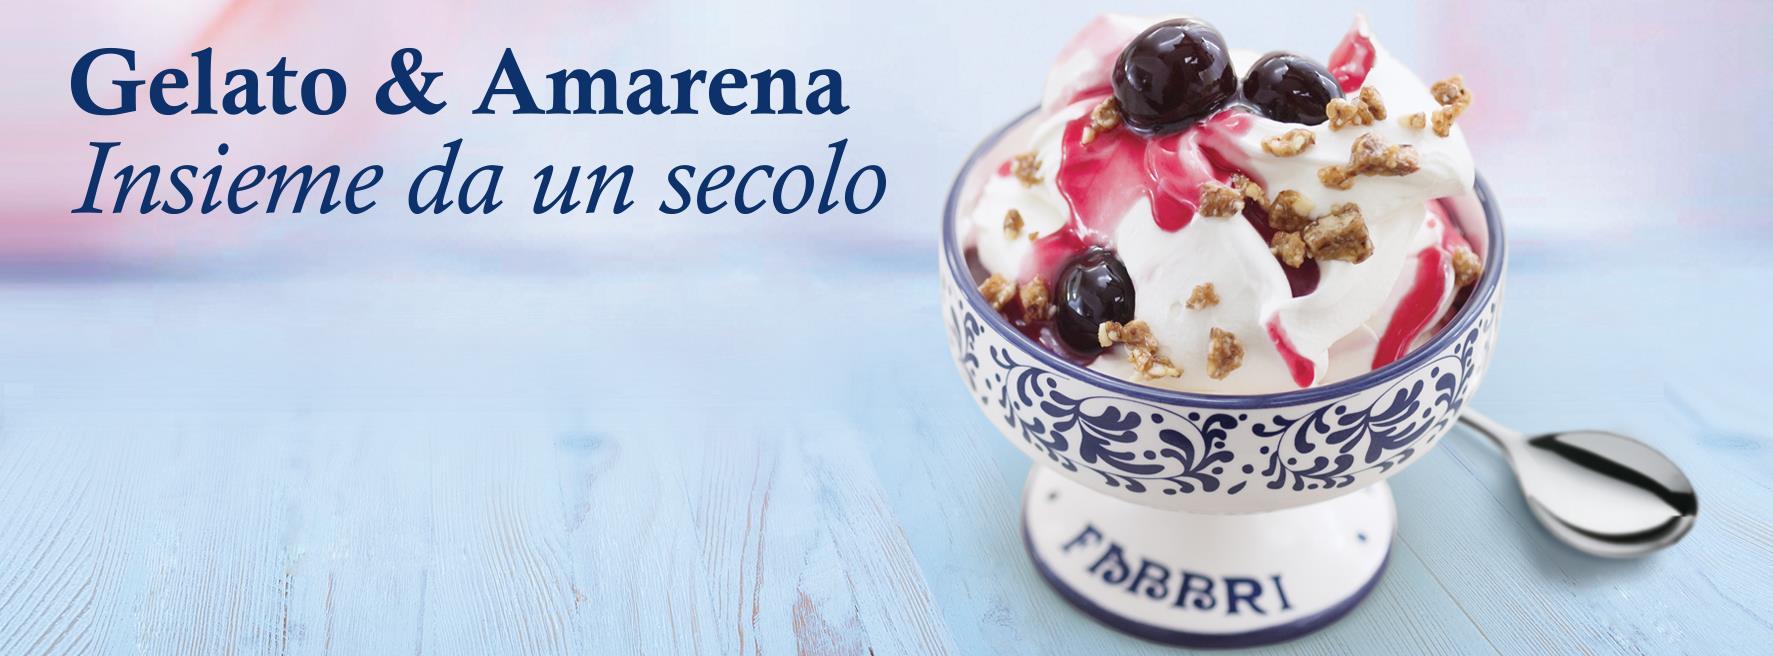 Amarena Fabbri vaso con gelato